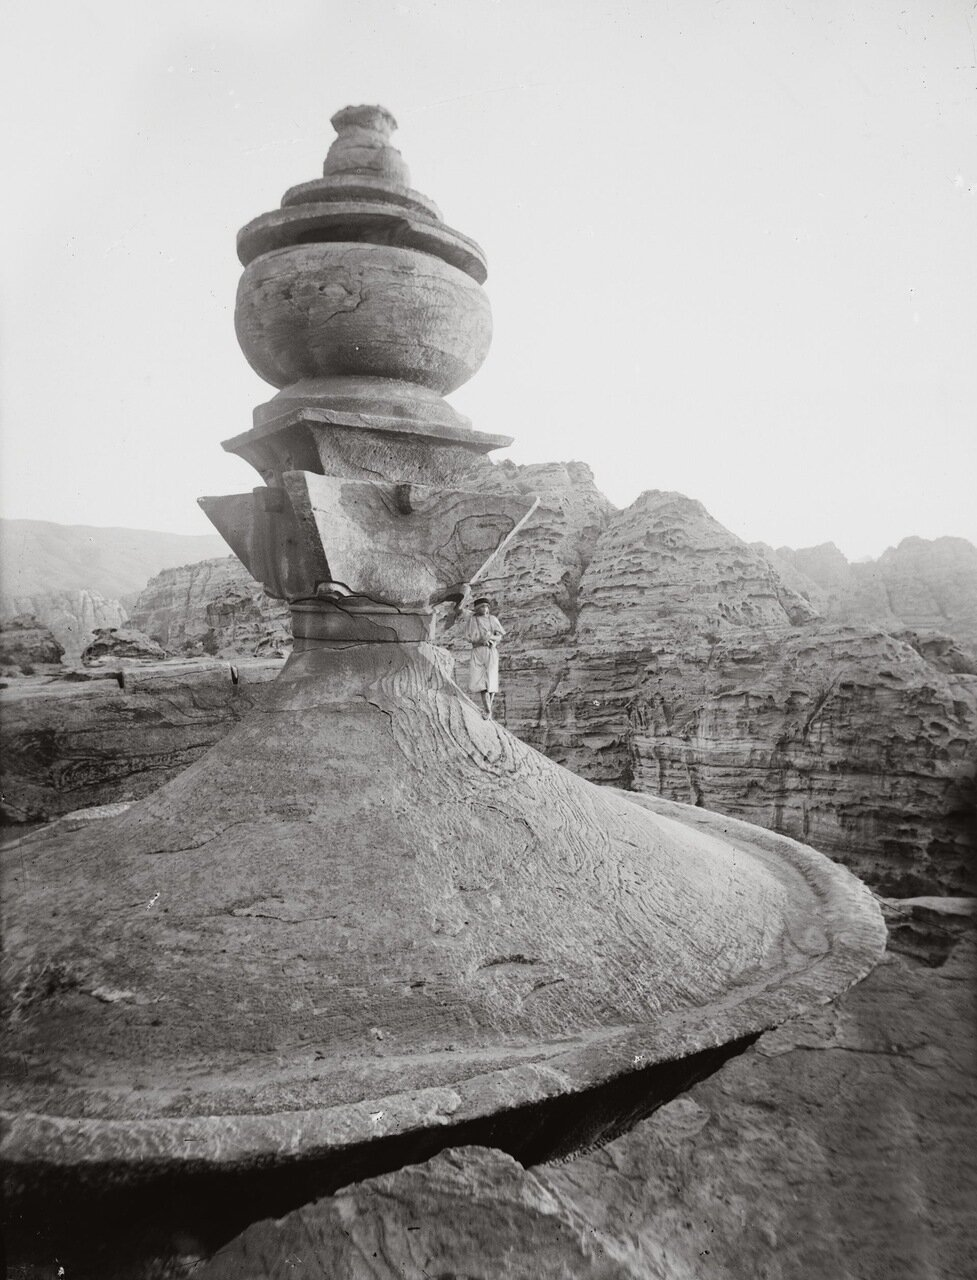 Урна Эд-Дейр. Петра, Трансиордания. 1900-1920 гг.